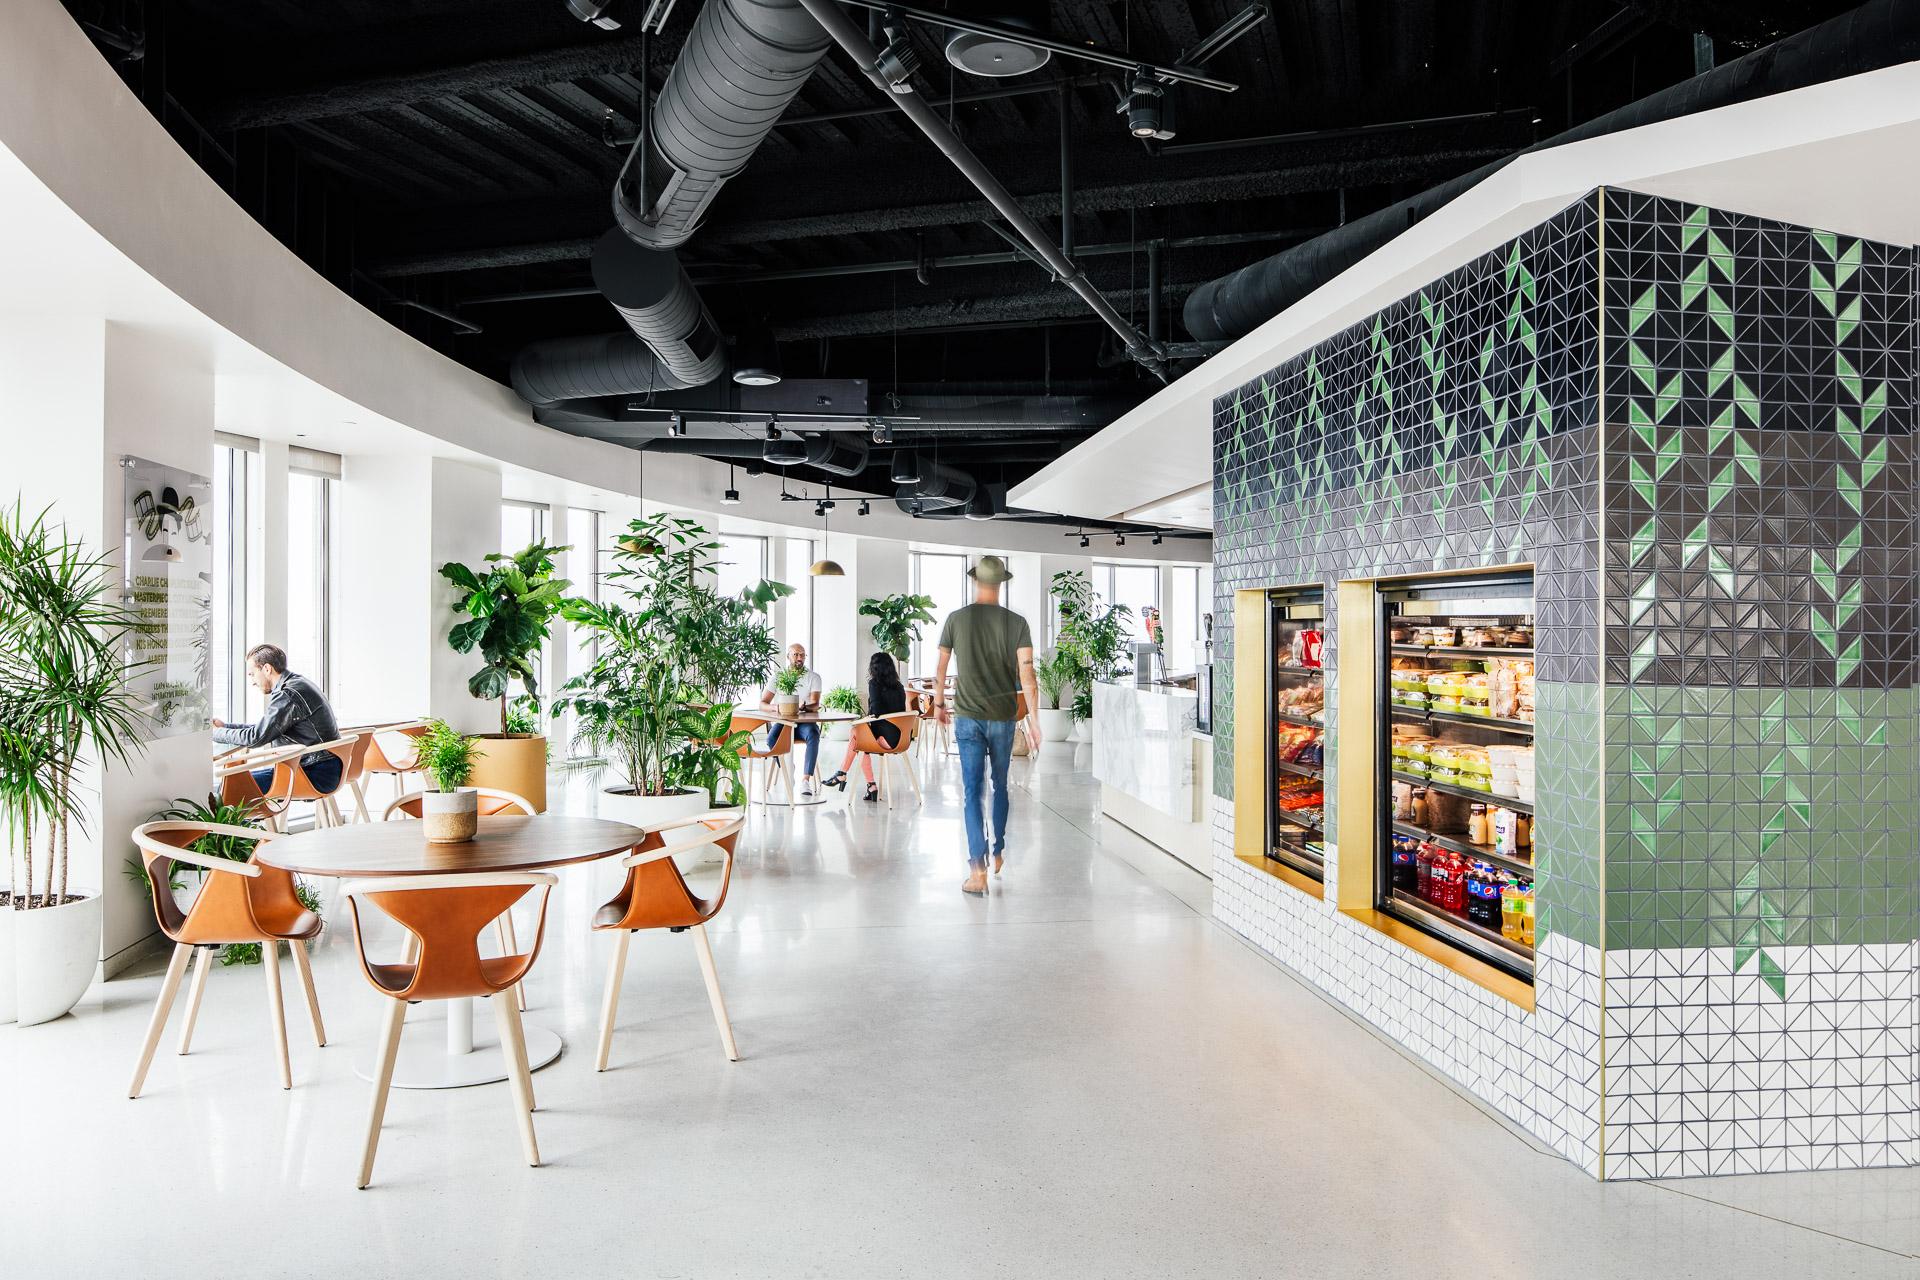 architectural-restaurant-interiors-photographer-los-angeles-oue-skyspace-dtla-4.jpg